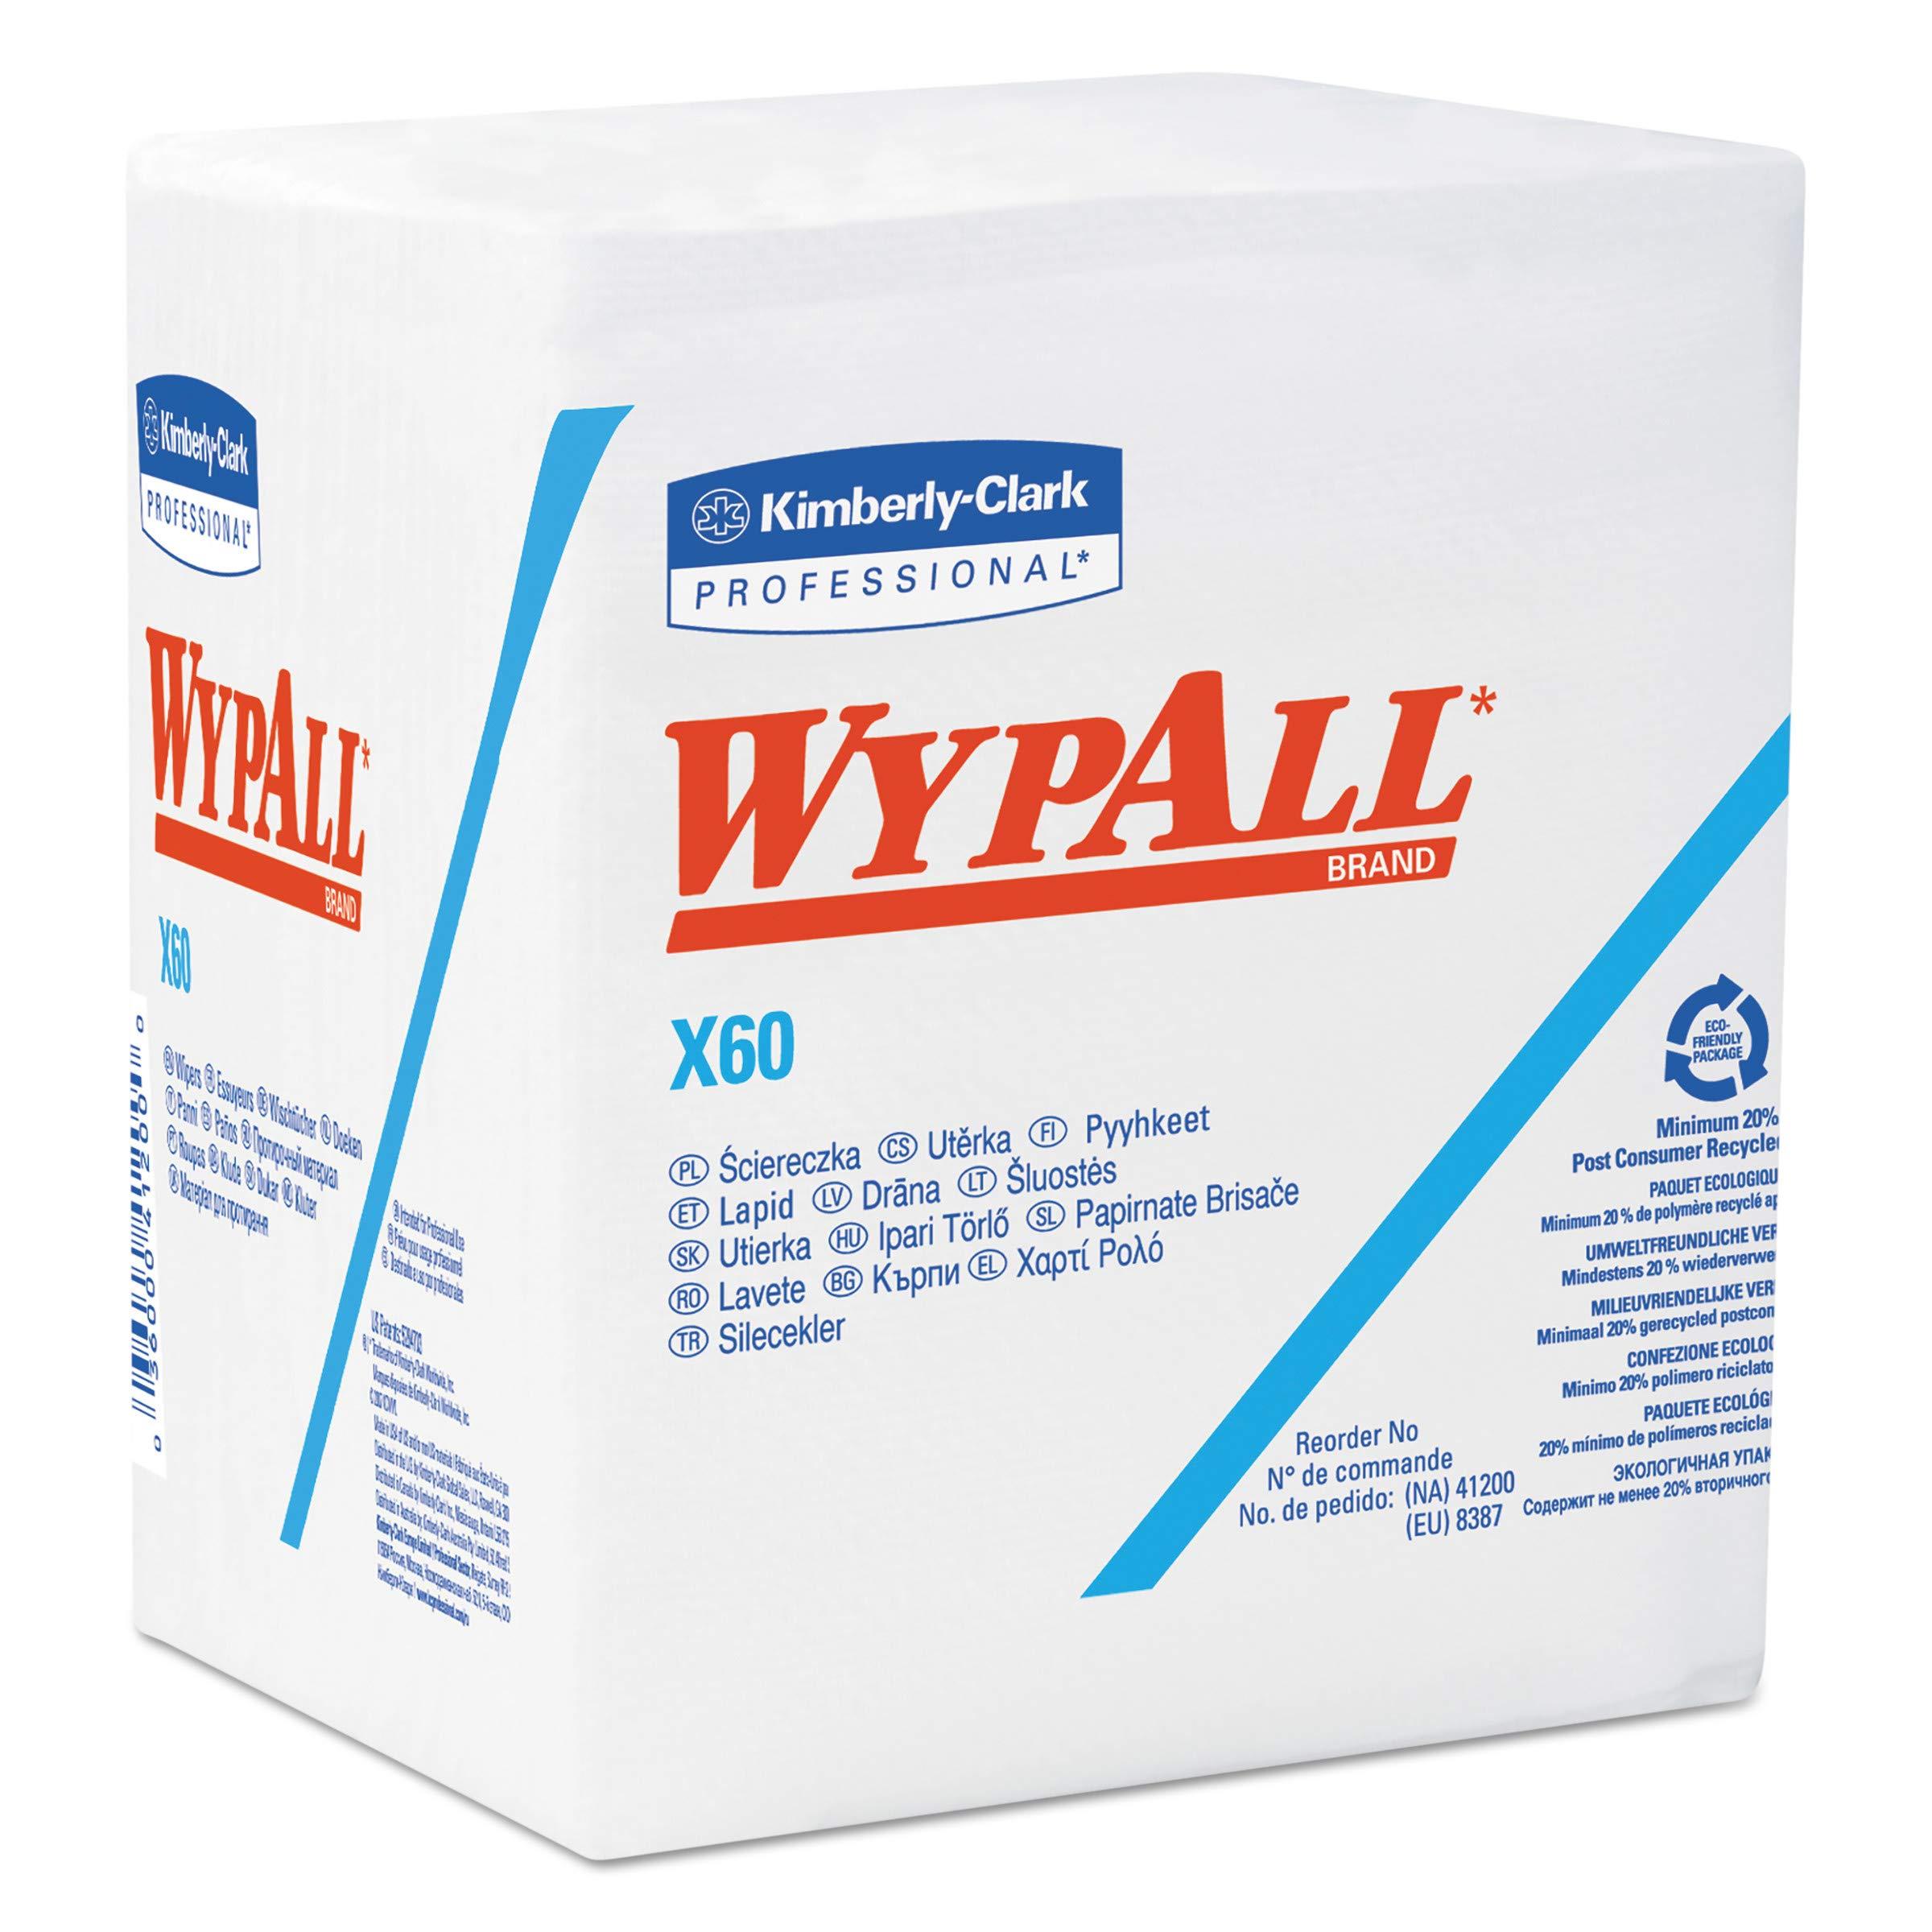 WypAll 34865 X60 Cloths, 1/4 Fold, 12 1/2 x 13, White, 76 per Box (Case of 12 Boxes)